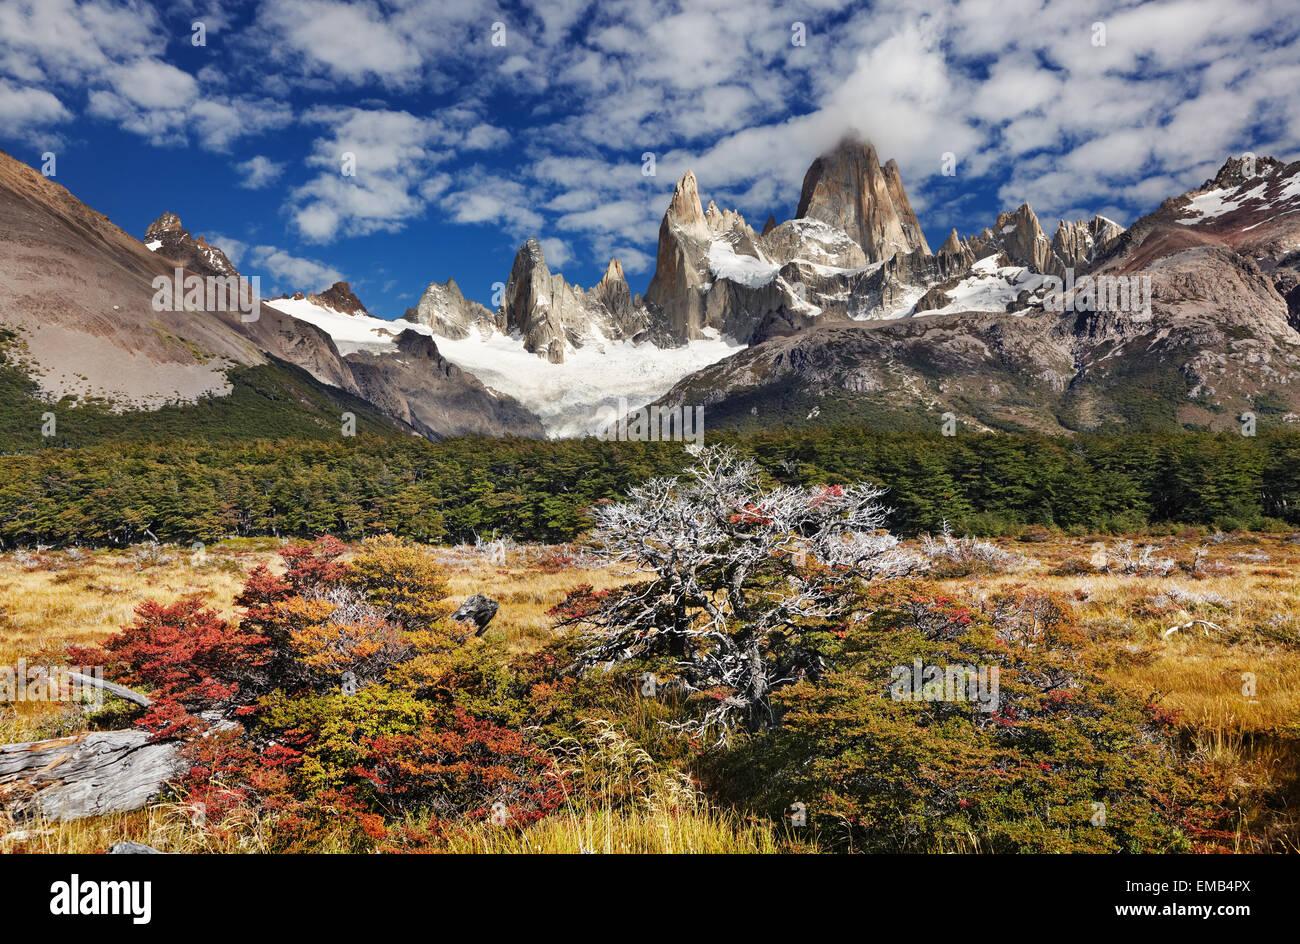 Mount Fitz Roy, Nationalpark Los Glaciares, Patagonien, Argentinien Stockbild